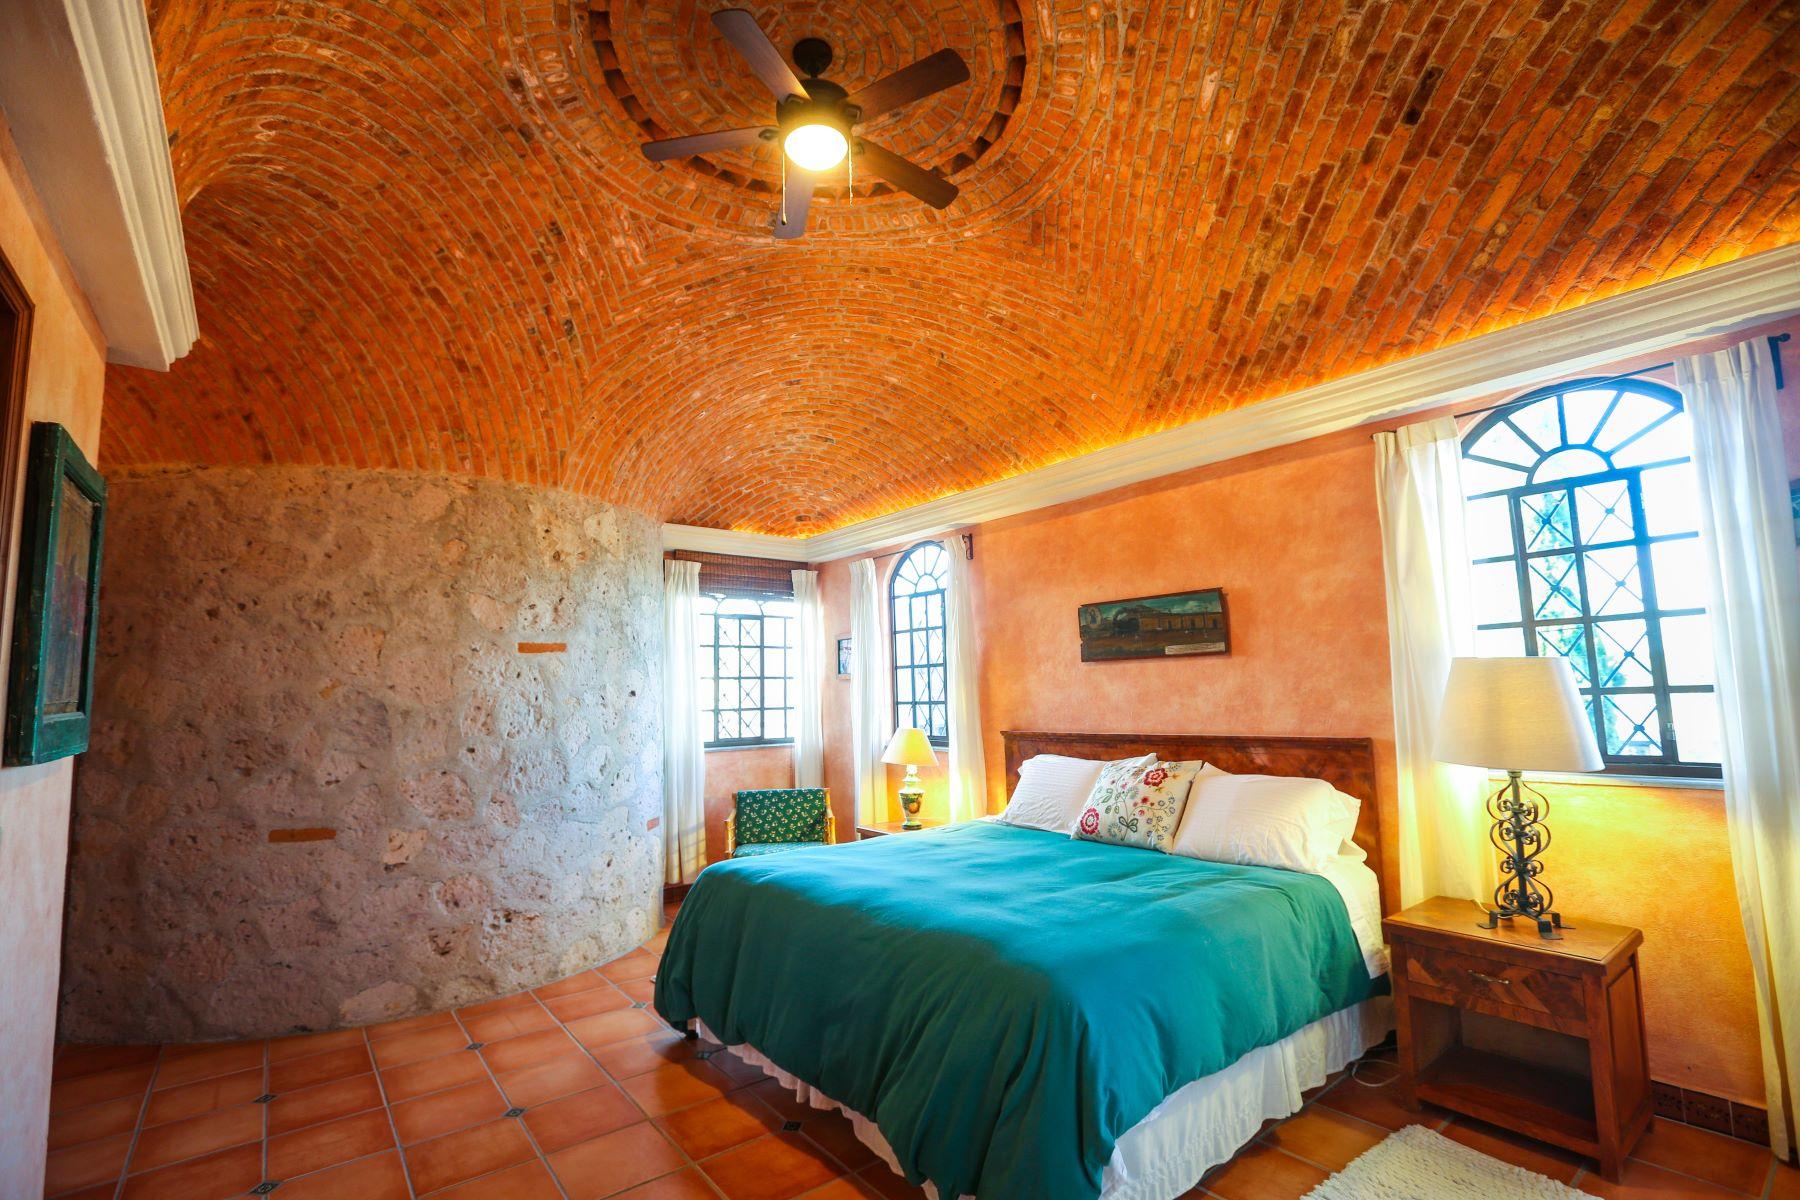 Additional photo for property listing at Casa Encantador Avenida Fray Juan de San Miguel 72 San Miguel De Allende, Guanajuato 37790 México